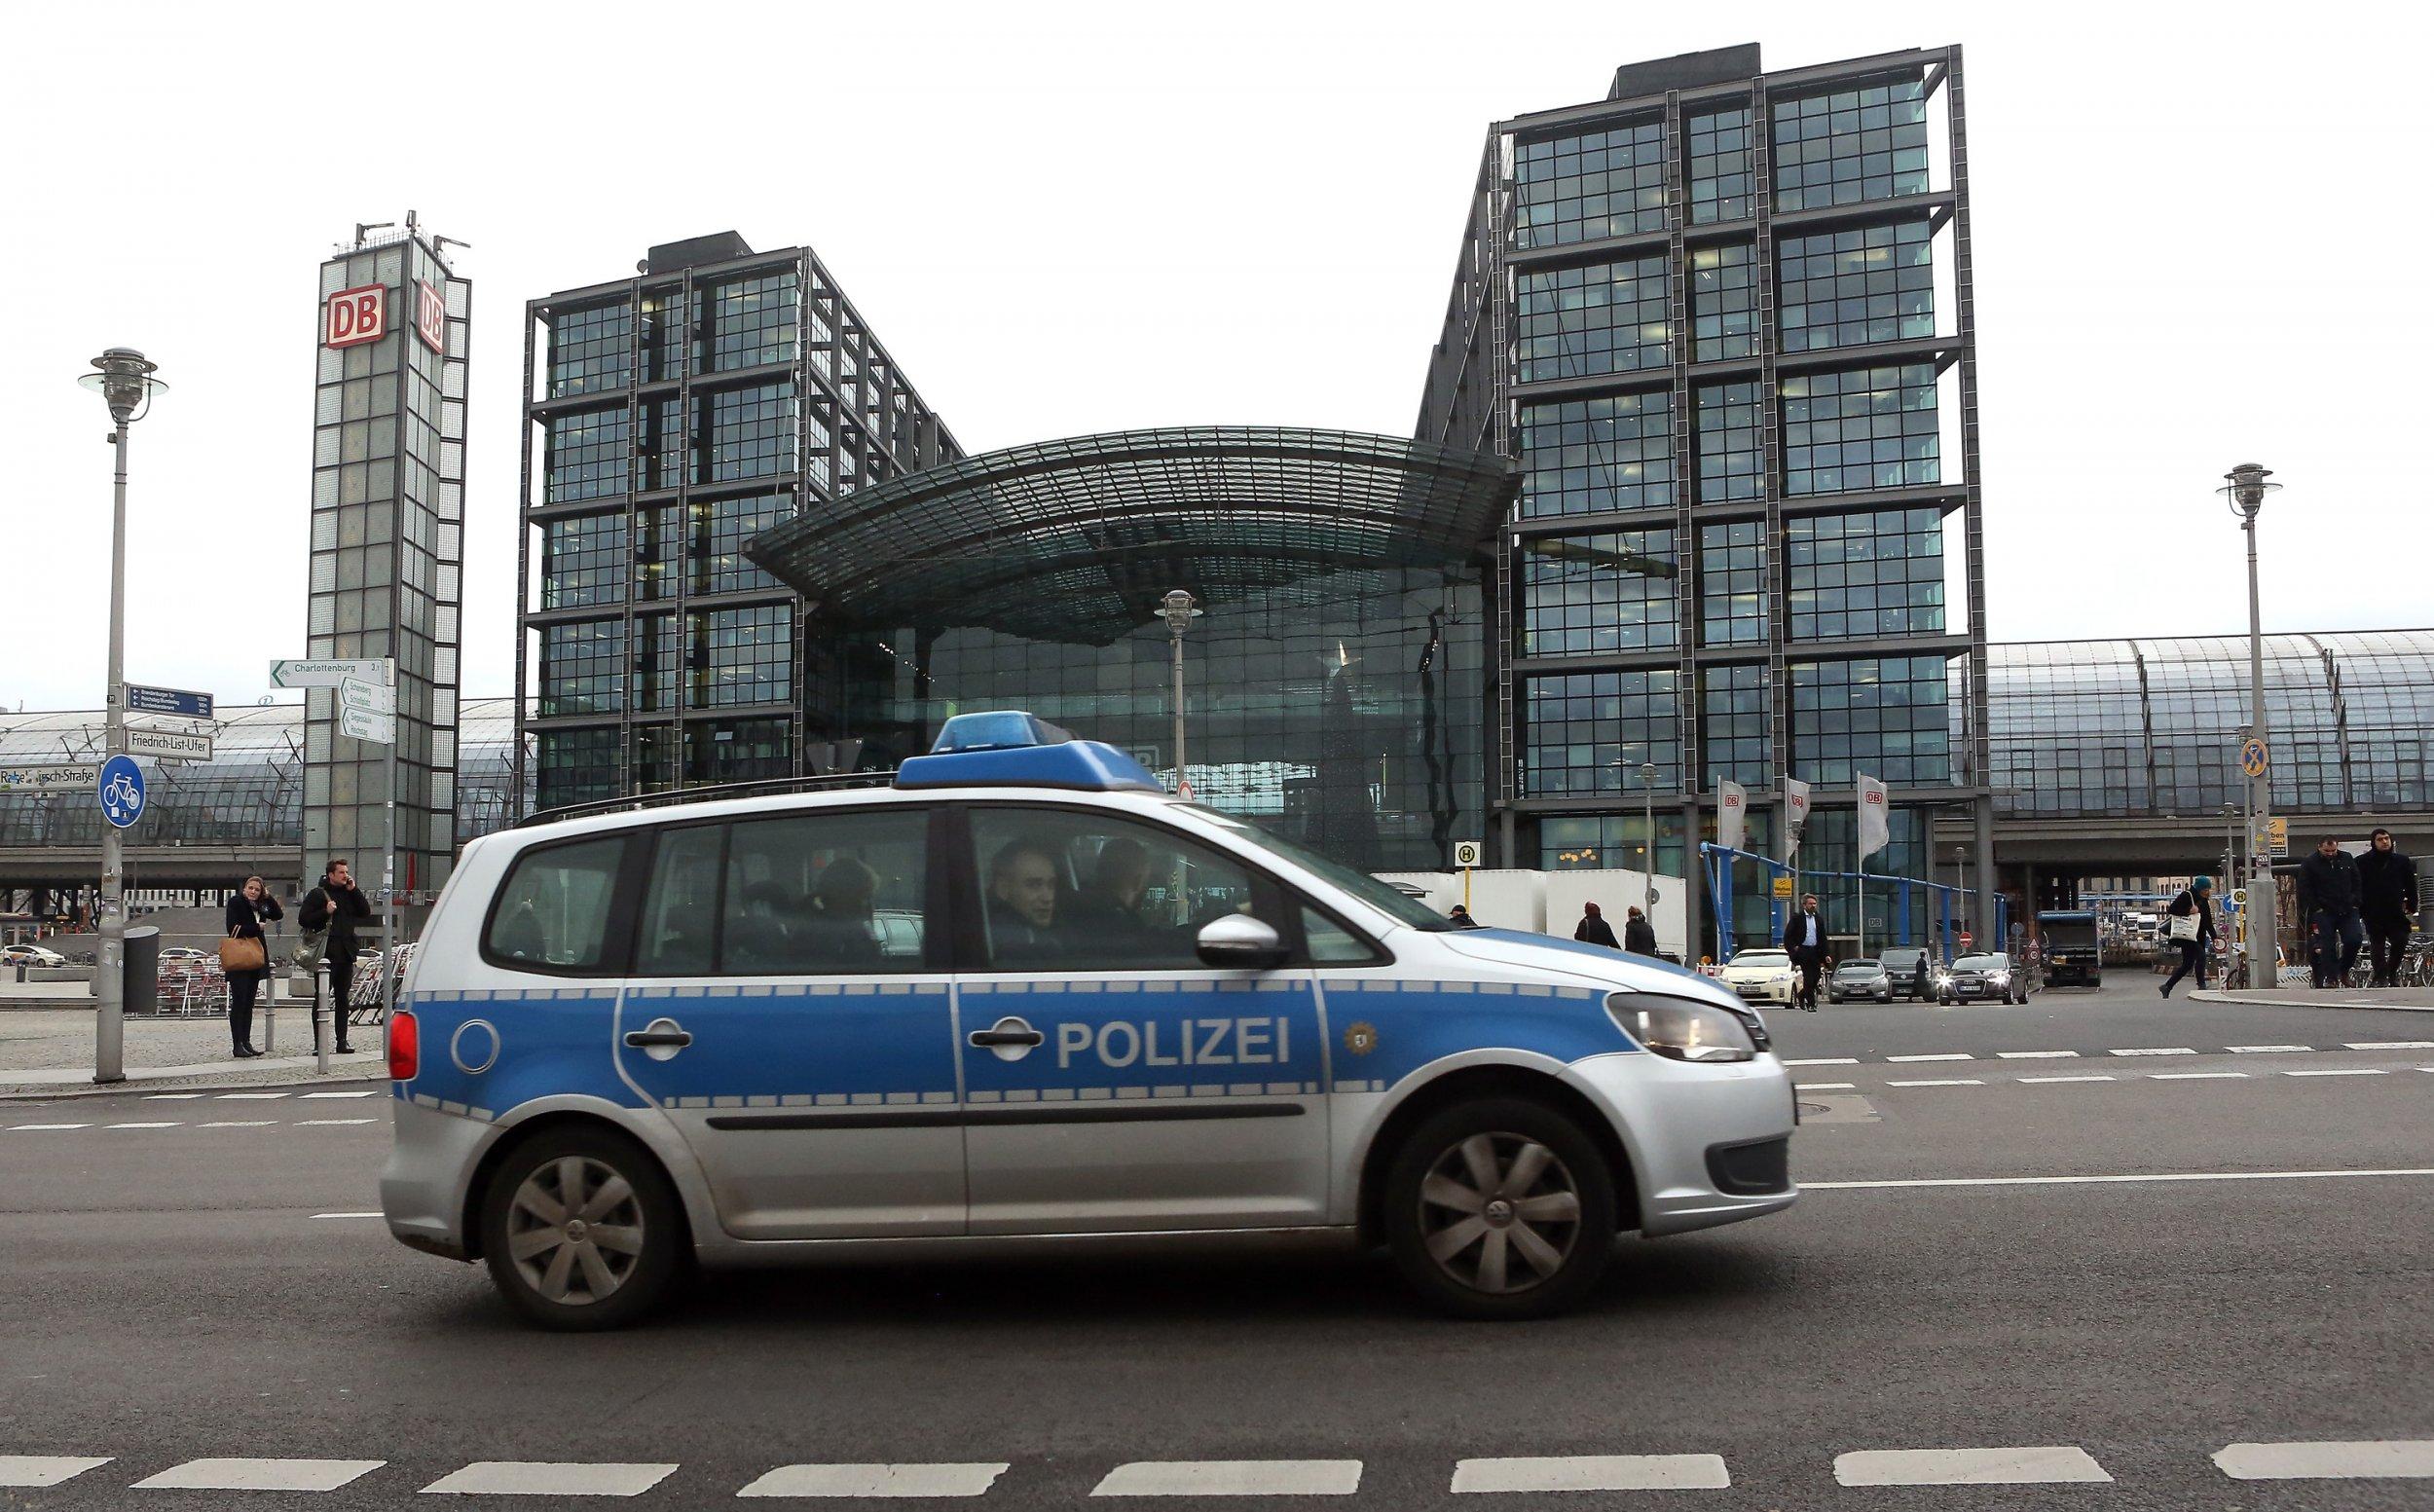 04_18_Berling_station